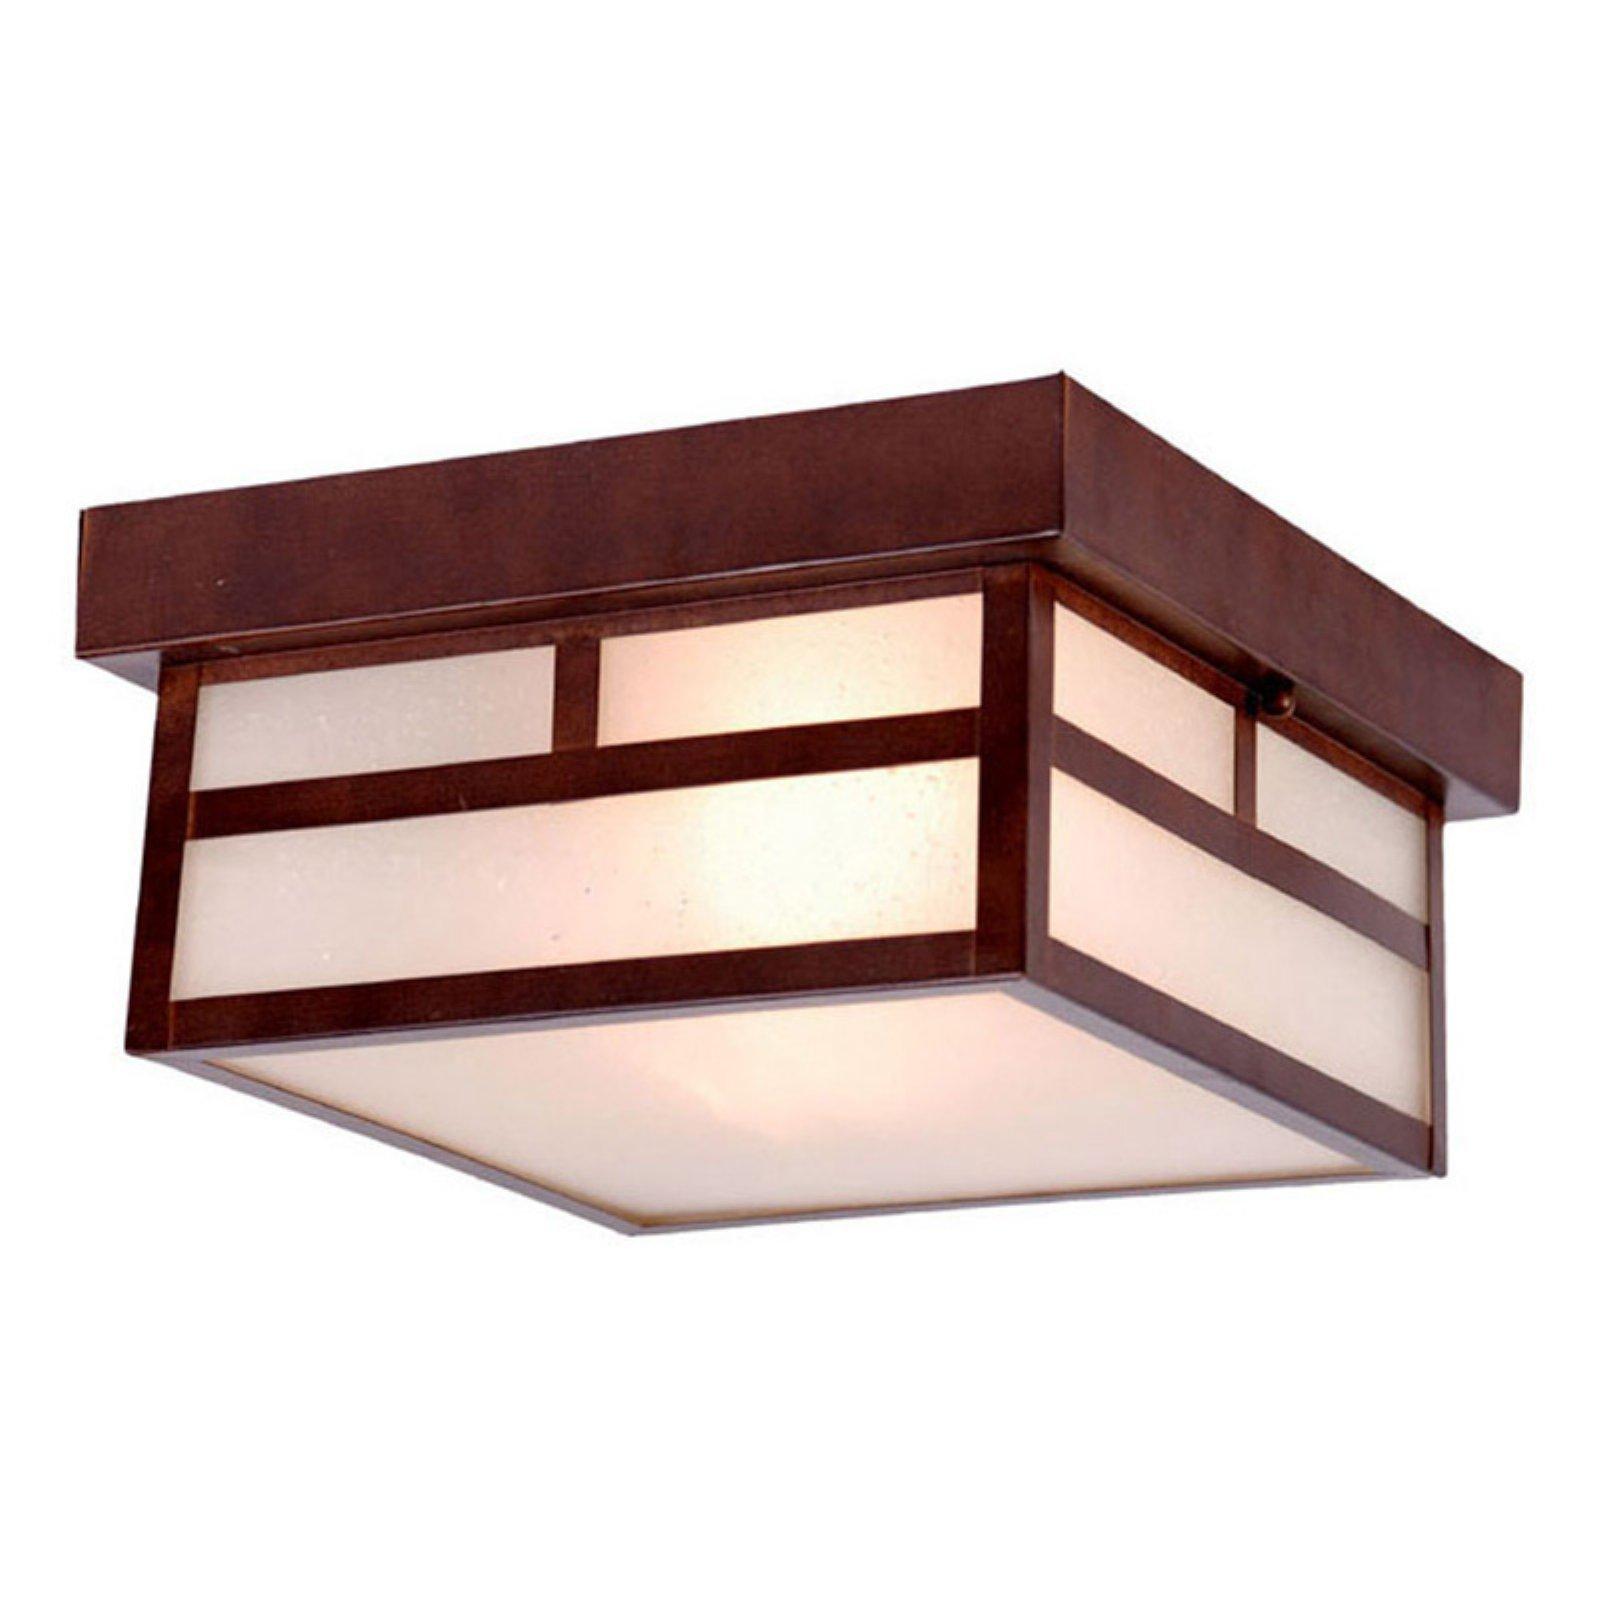 Acclaim Lighting Artisan 2 Light Outdoor Ceiling Mount Light Fixture by Acclaim Lighting